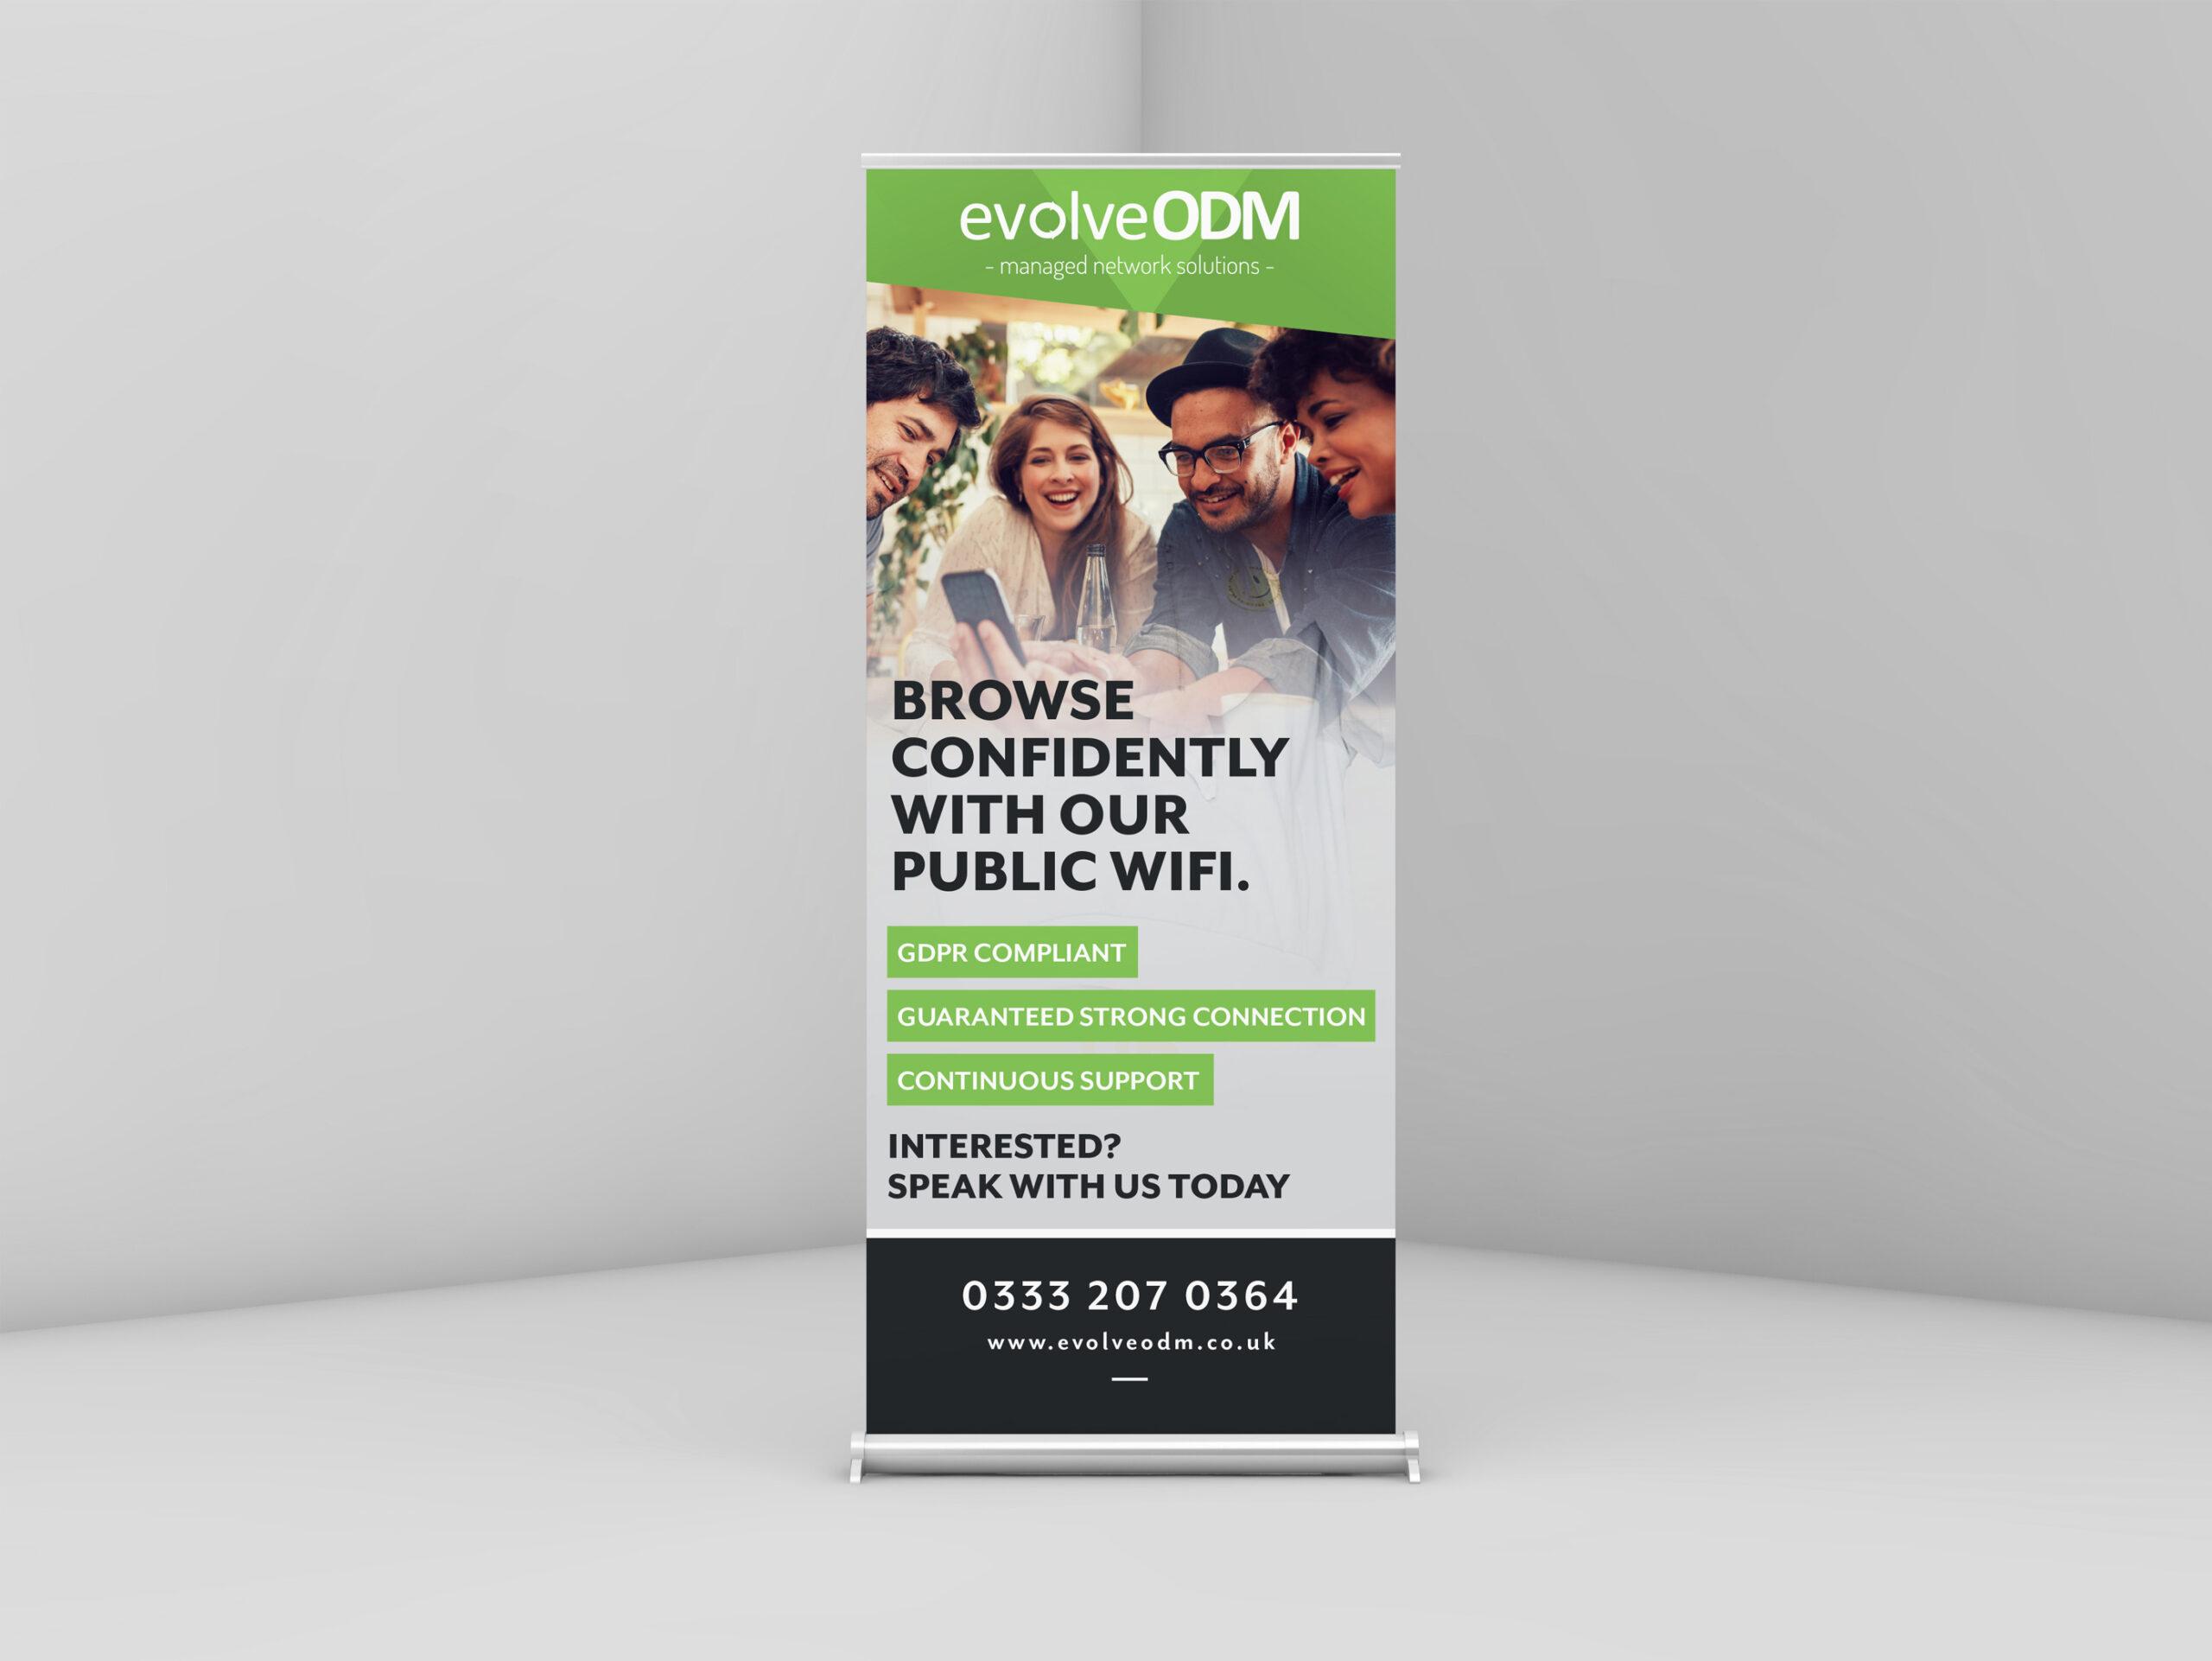 EvolveODM Marketing Material design and print by Very Vivid Graphic Designer Blackburn, Lancashire